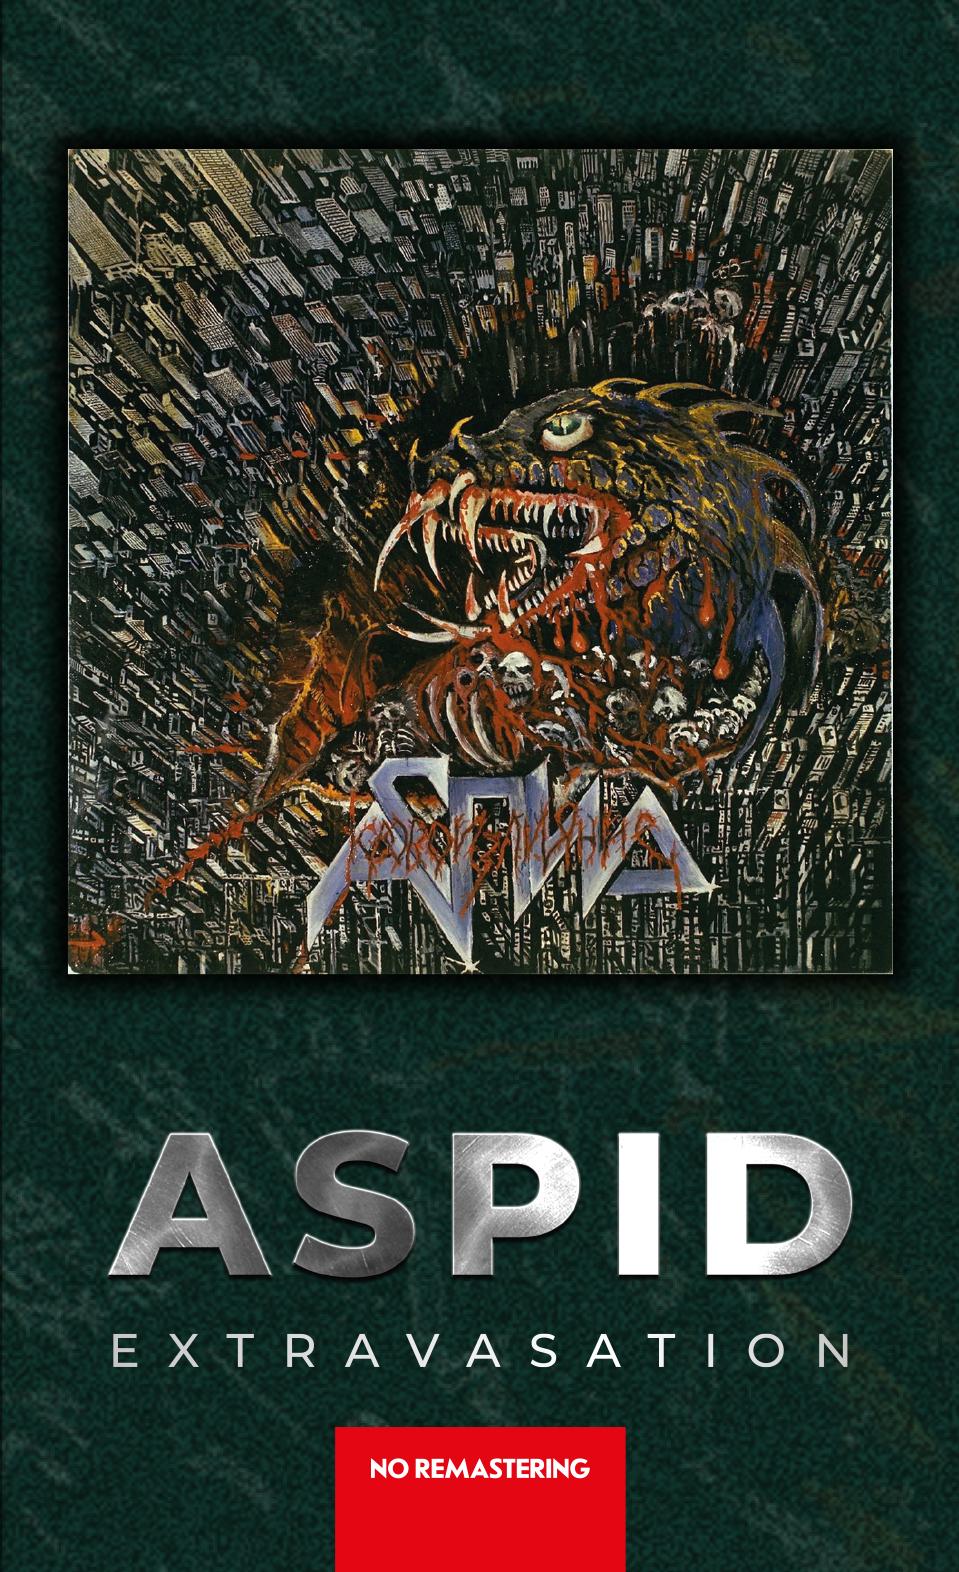 Аспид - Кровоизлияние - MC